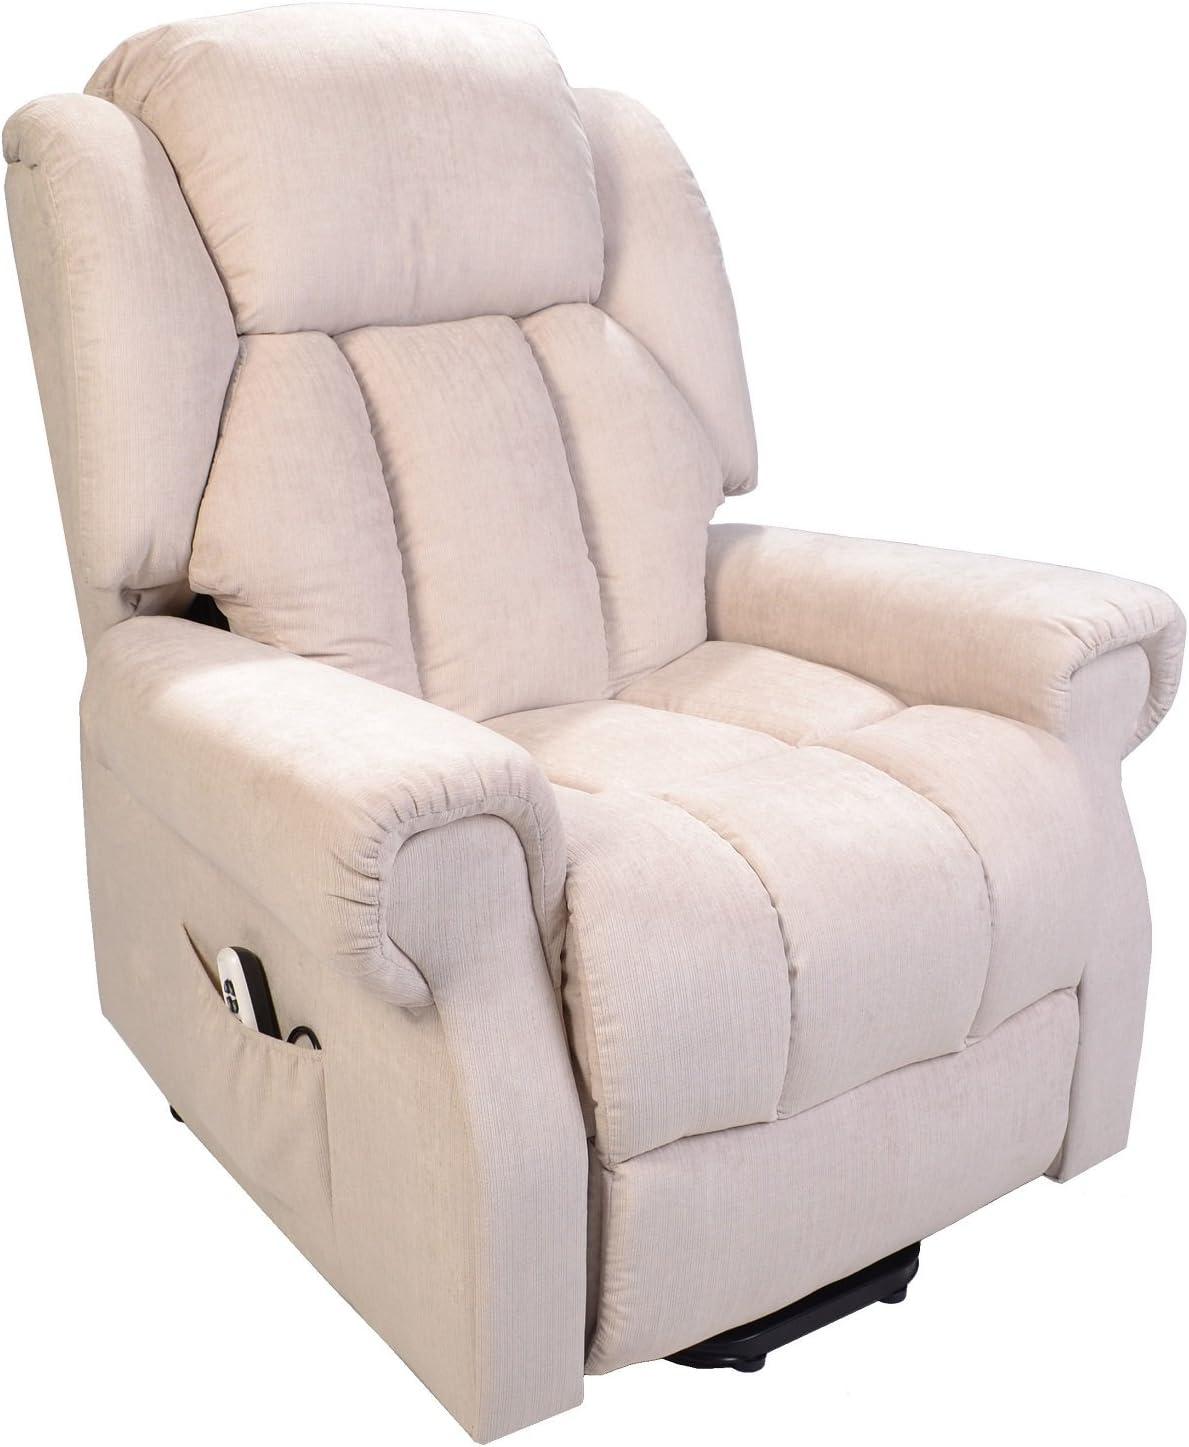 Hainworth Dual Motor riser recliner chair rise lift with